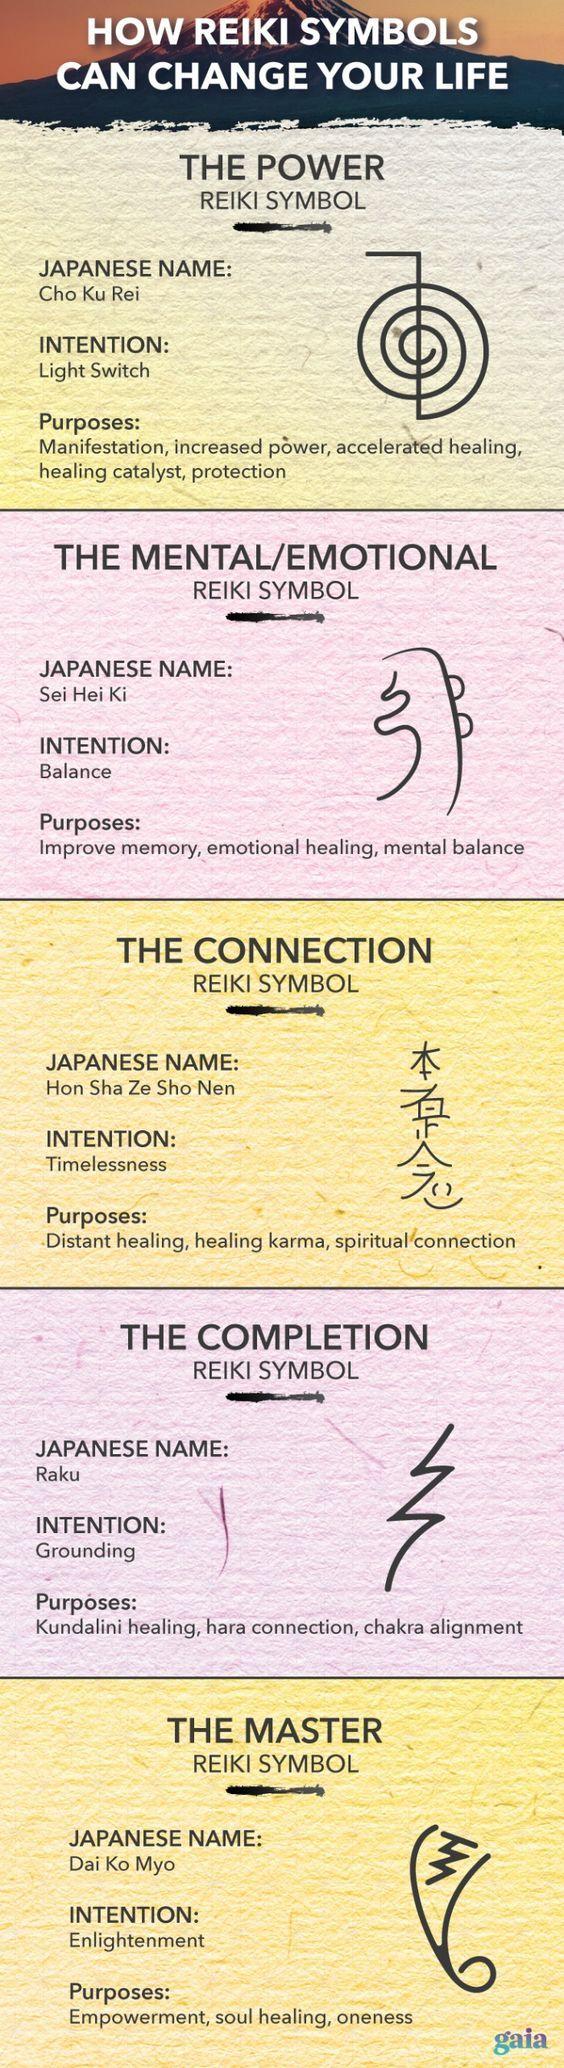 Dr mikao usui reiki symbols reiki symbols symbols and spiritual learn how reiki symbols can change your life here are five reiki symbols you should biocorpaavc Image collections